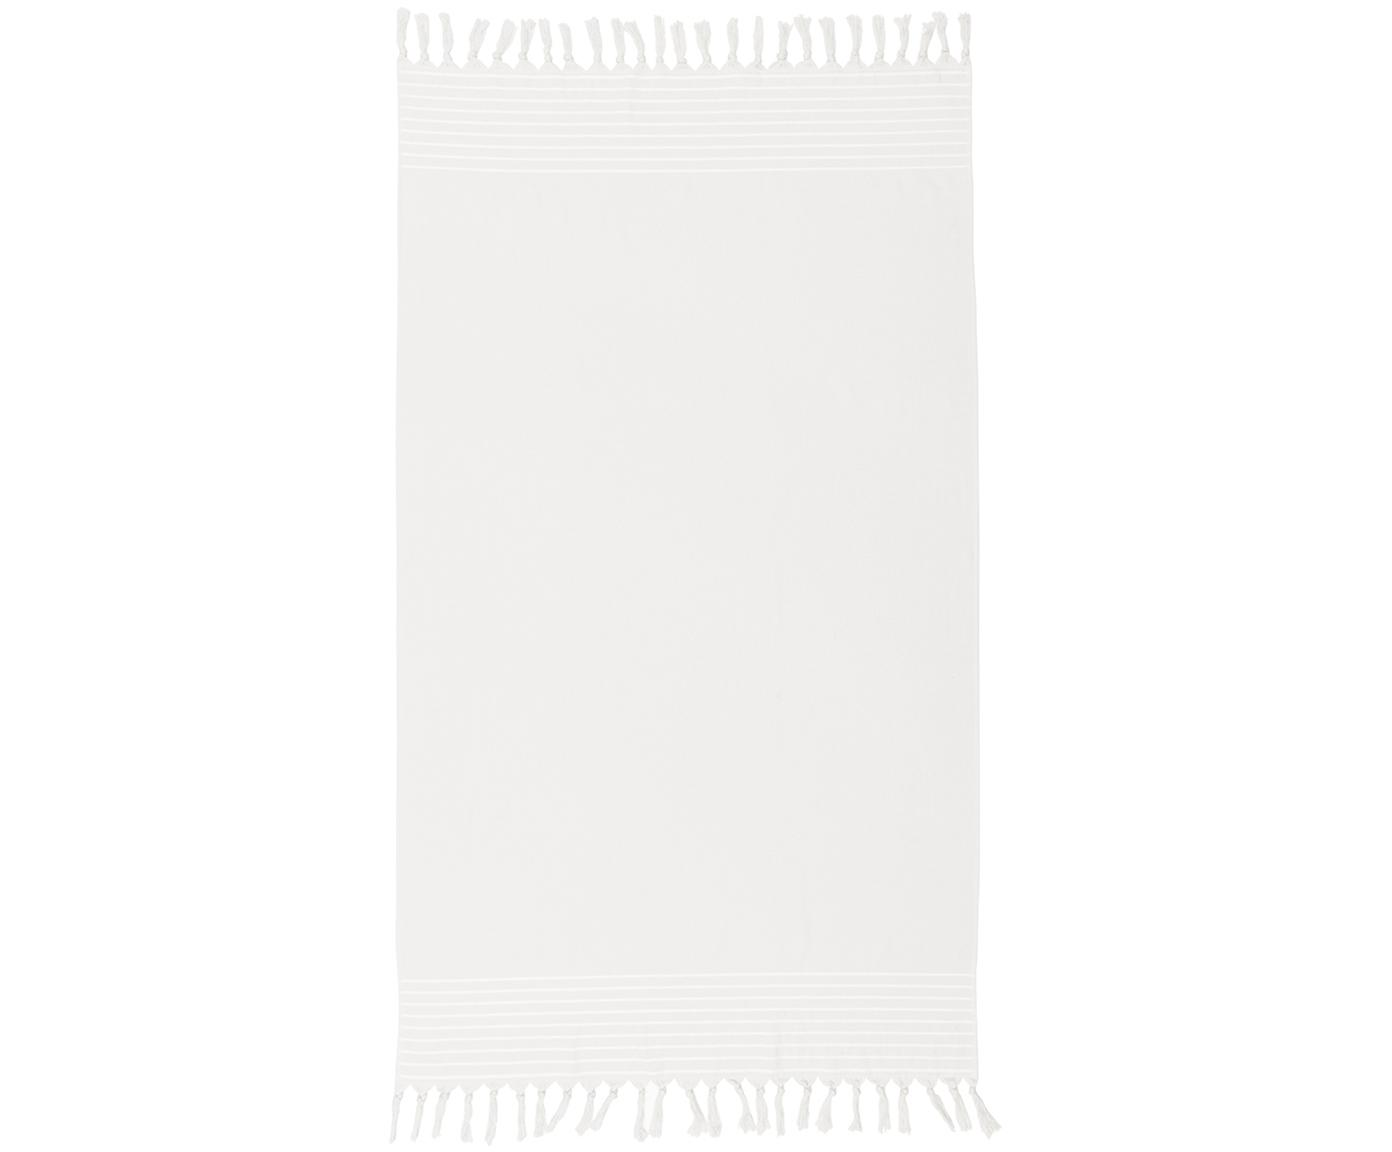 Fouta de felpa rizada Freddy, Parte trasera: felpa rizada, Blanco crema, An 100 x L 180 cm